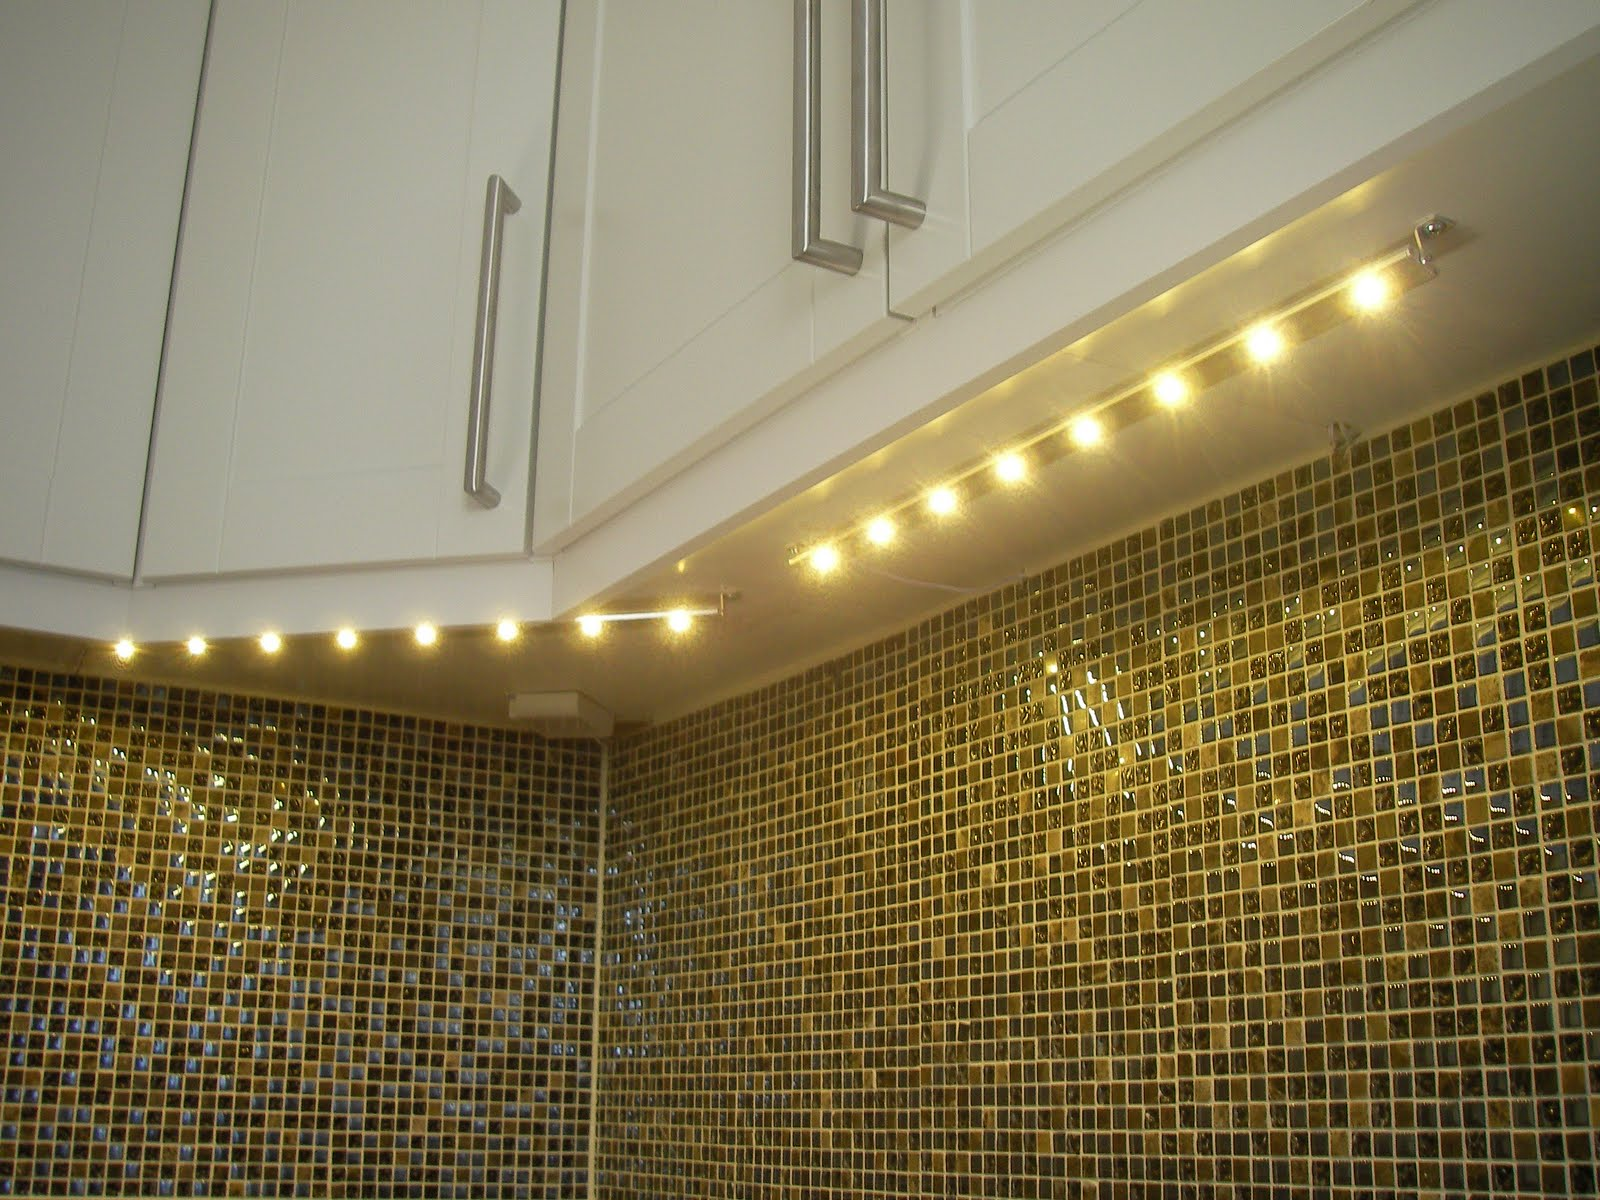 Led Belysning Koket : led belysning koket  LED belysning